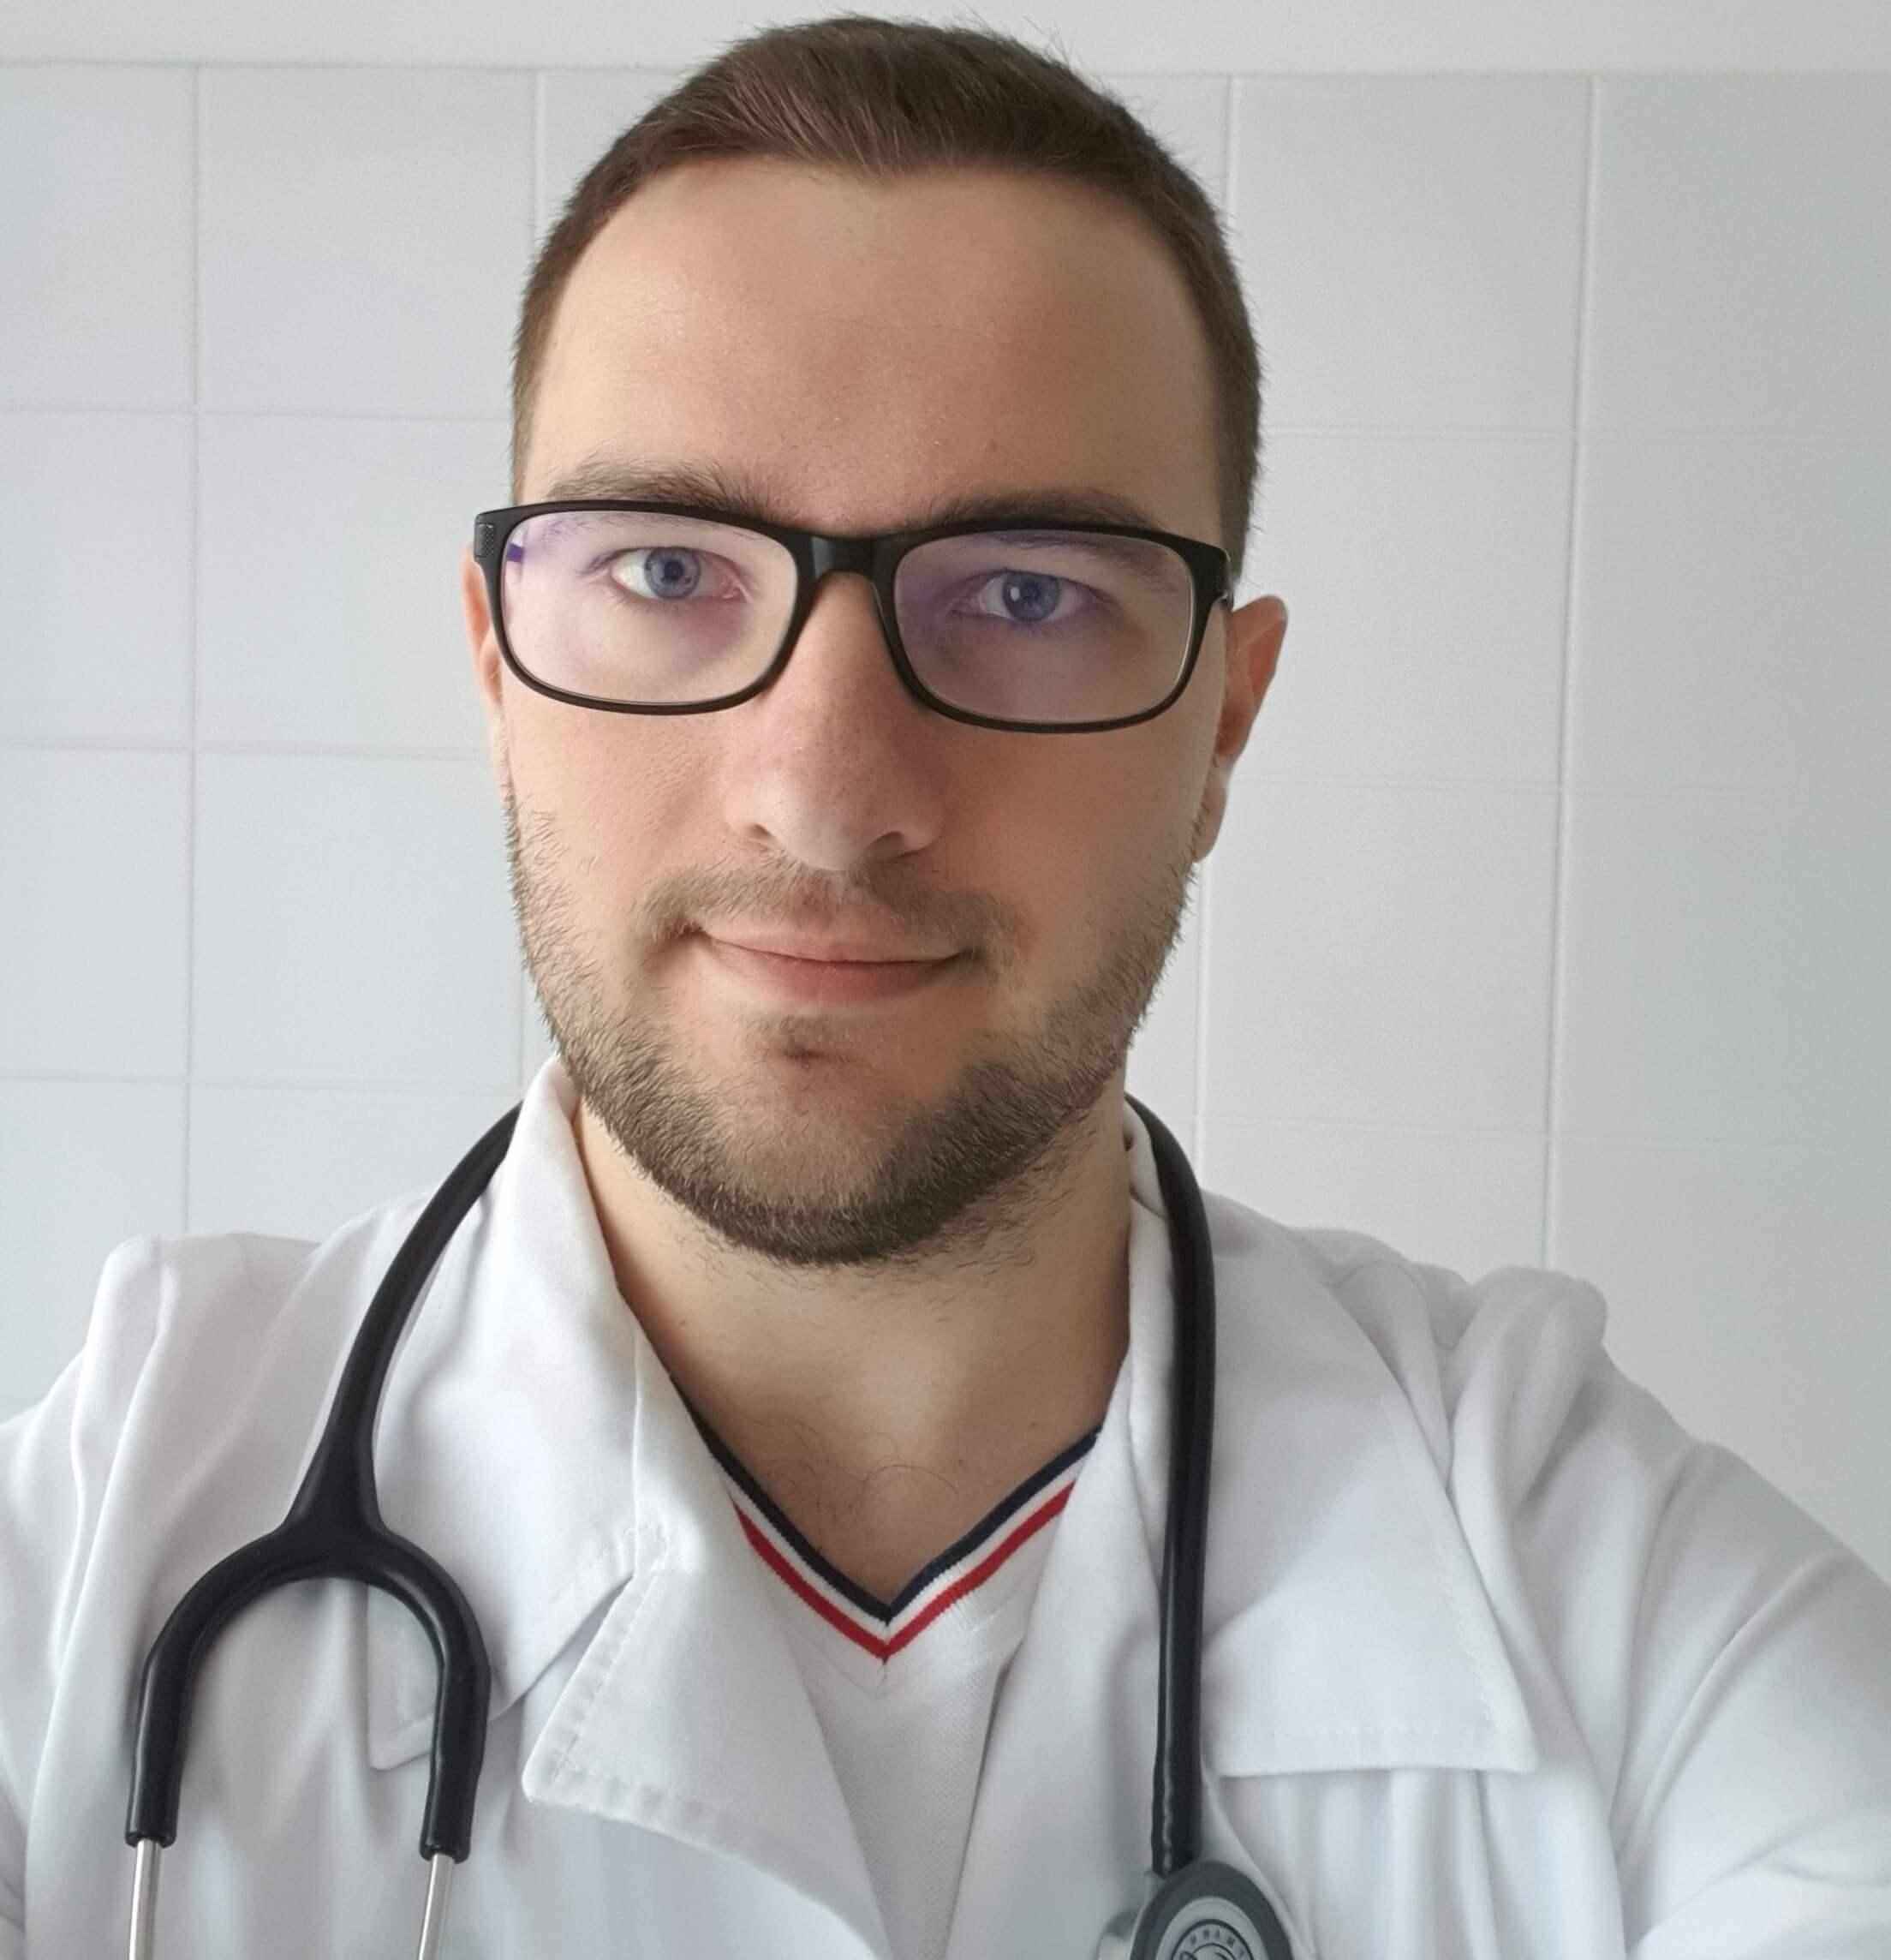 Dr. Girhiny Tamás 10